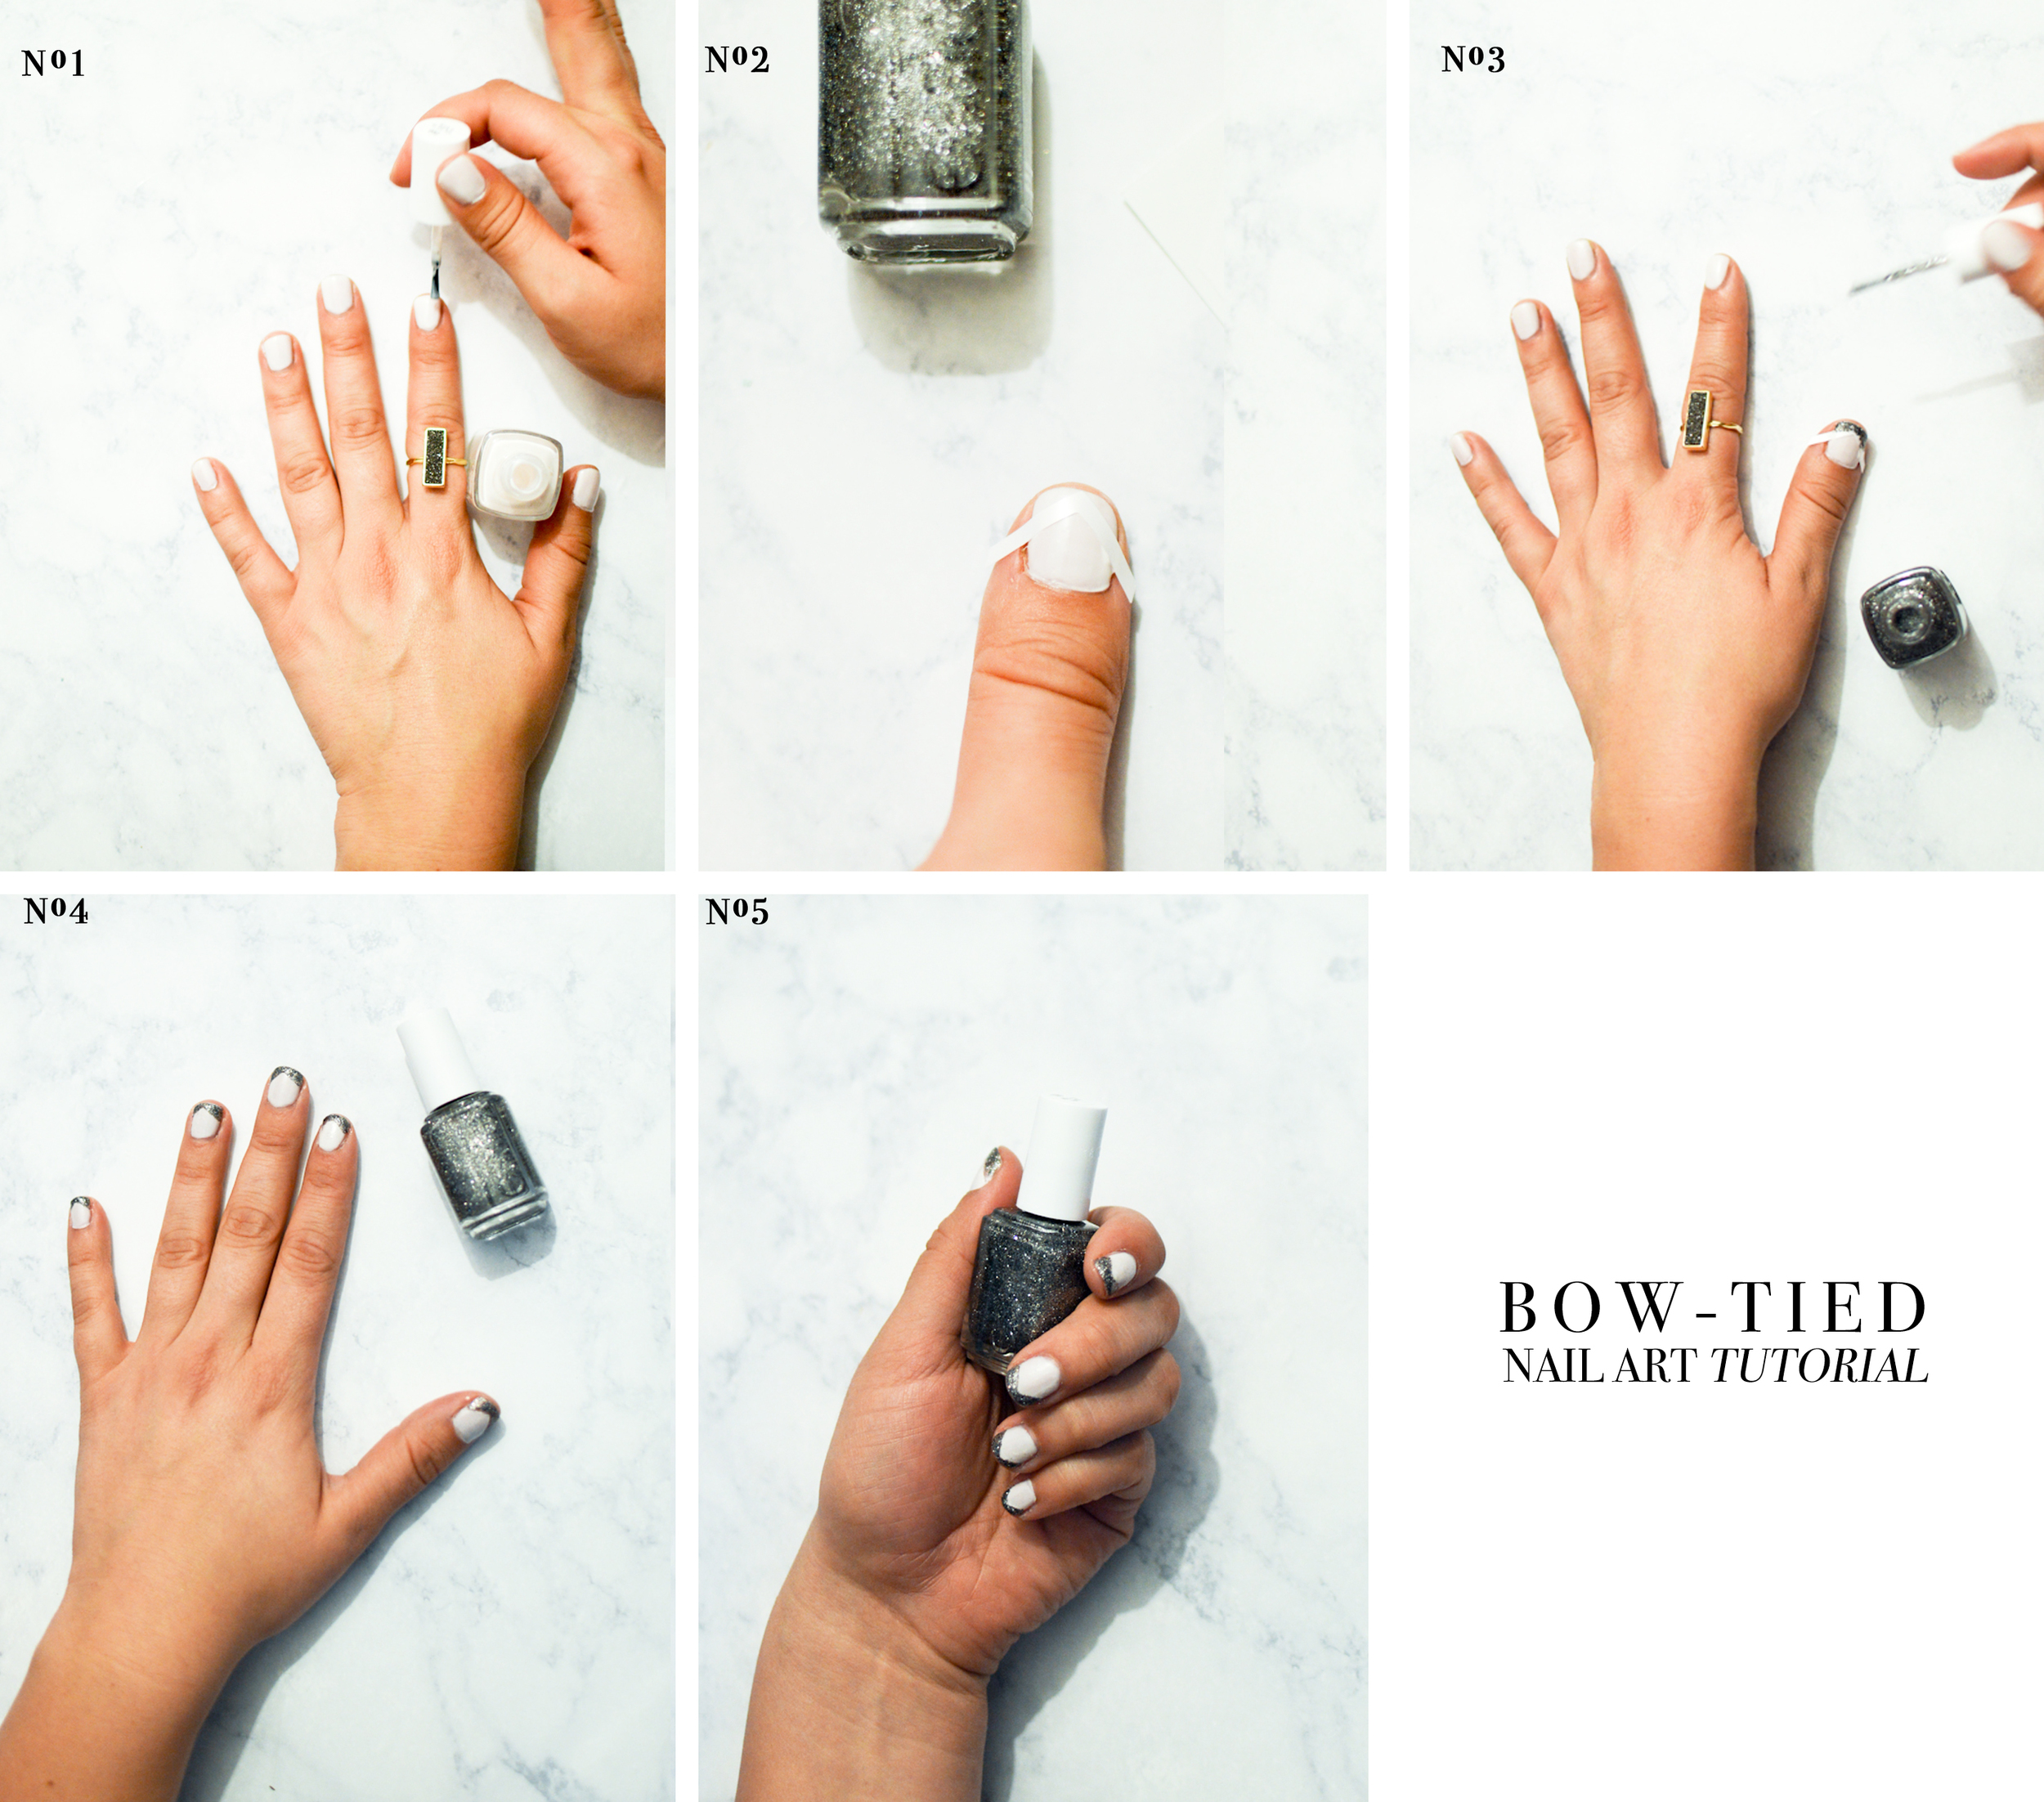 Bow-tied nail art tutorial via. Birdie Shoots